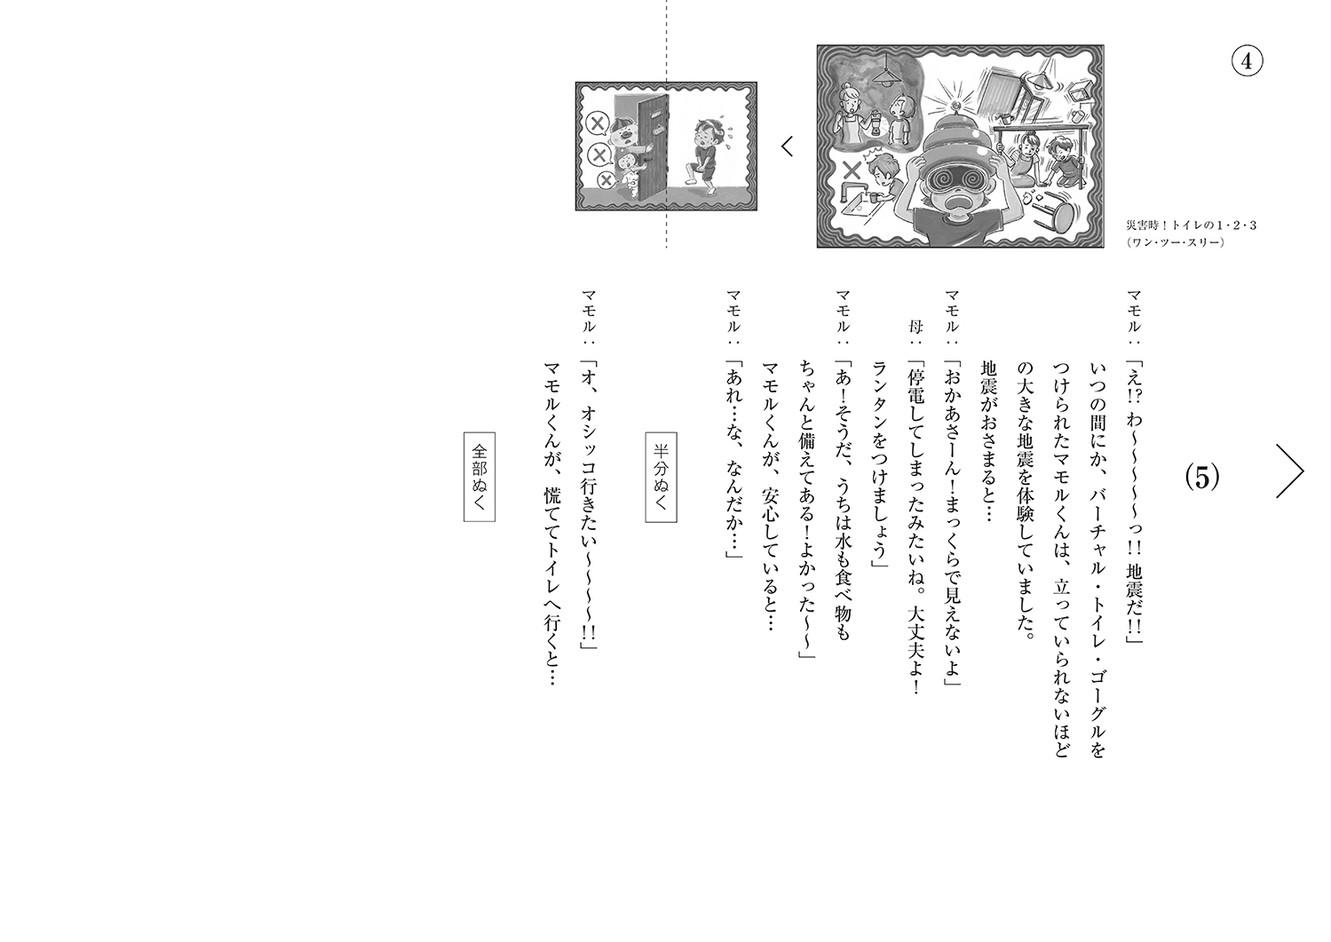 kanaweb_toiletkamishibai_010.jpg